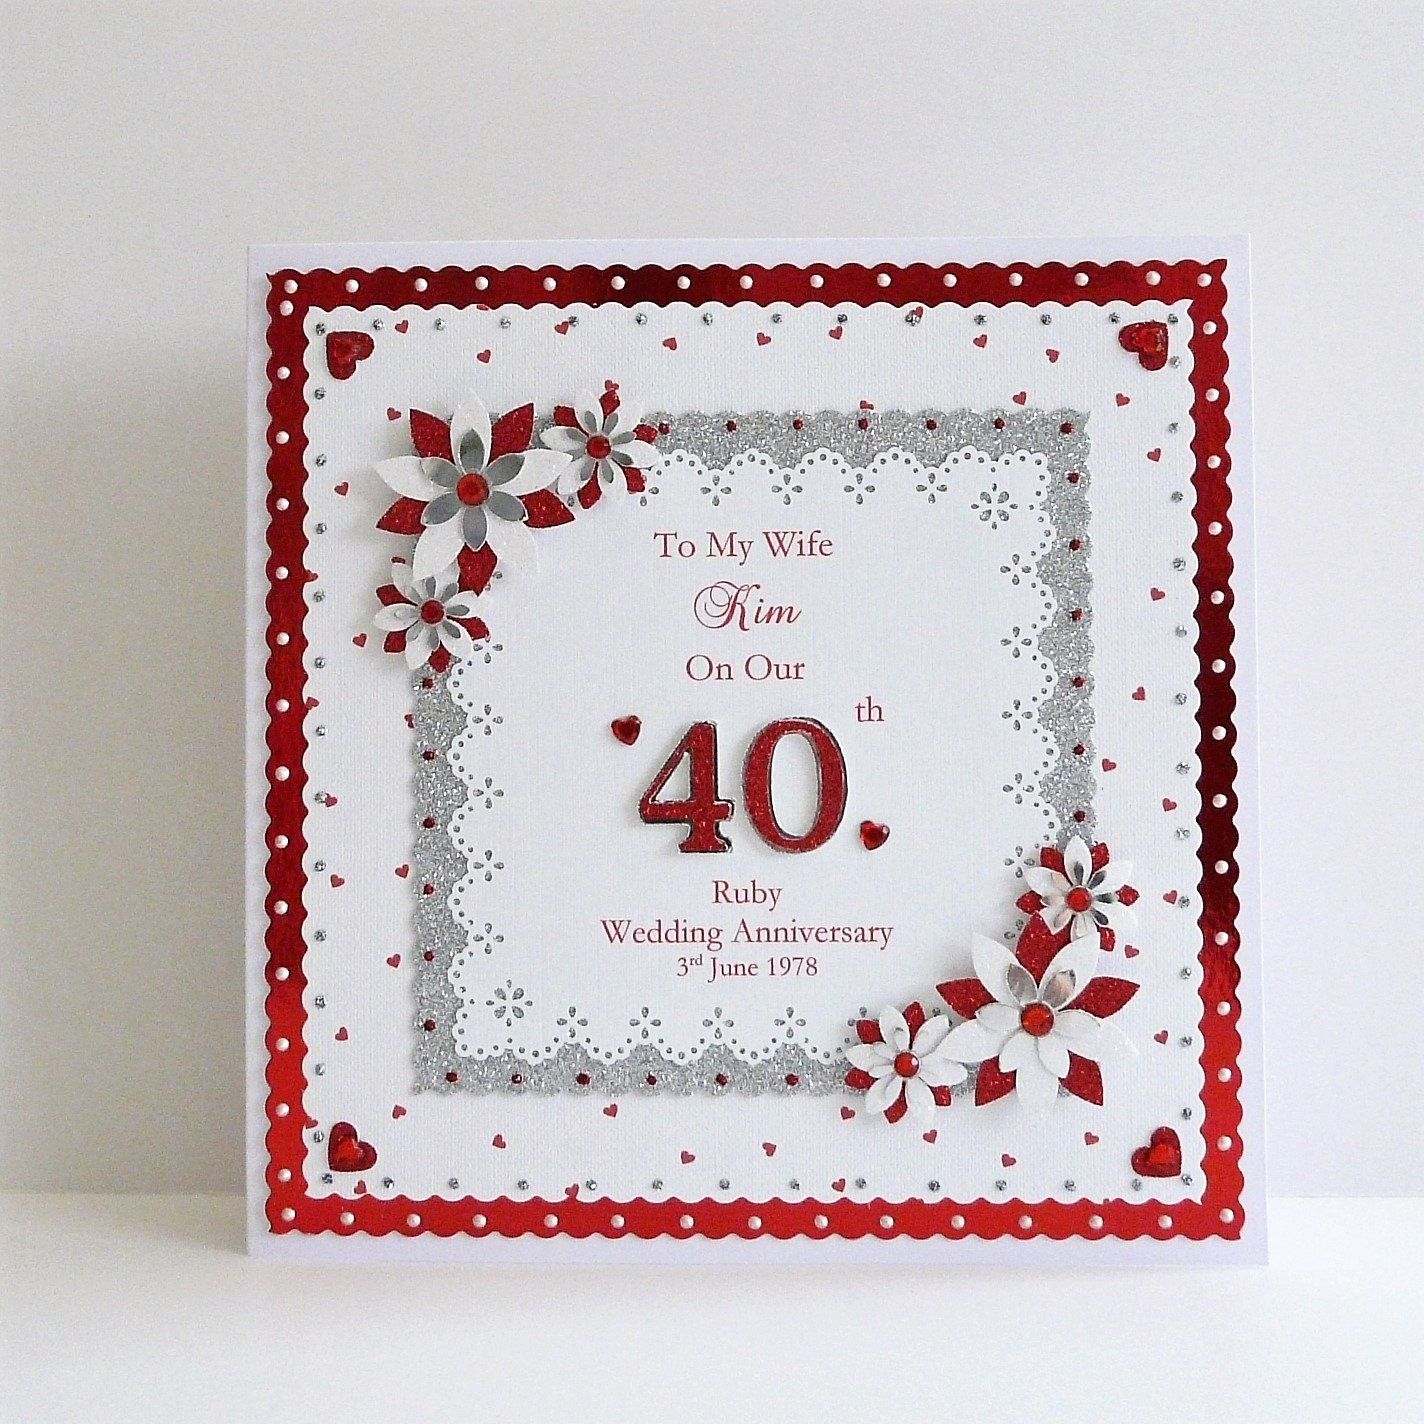 40th Ruby Wedding Anniversary Card Wife Husband Mum Dad Nan Grandad Etc Wit Wedding Anniversary Cards 30th Wedding Anniversary Card Anniversary Cards Handmade